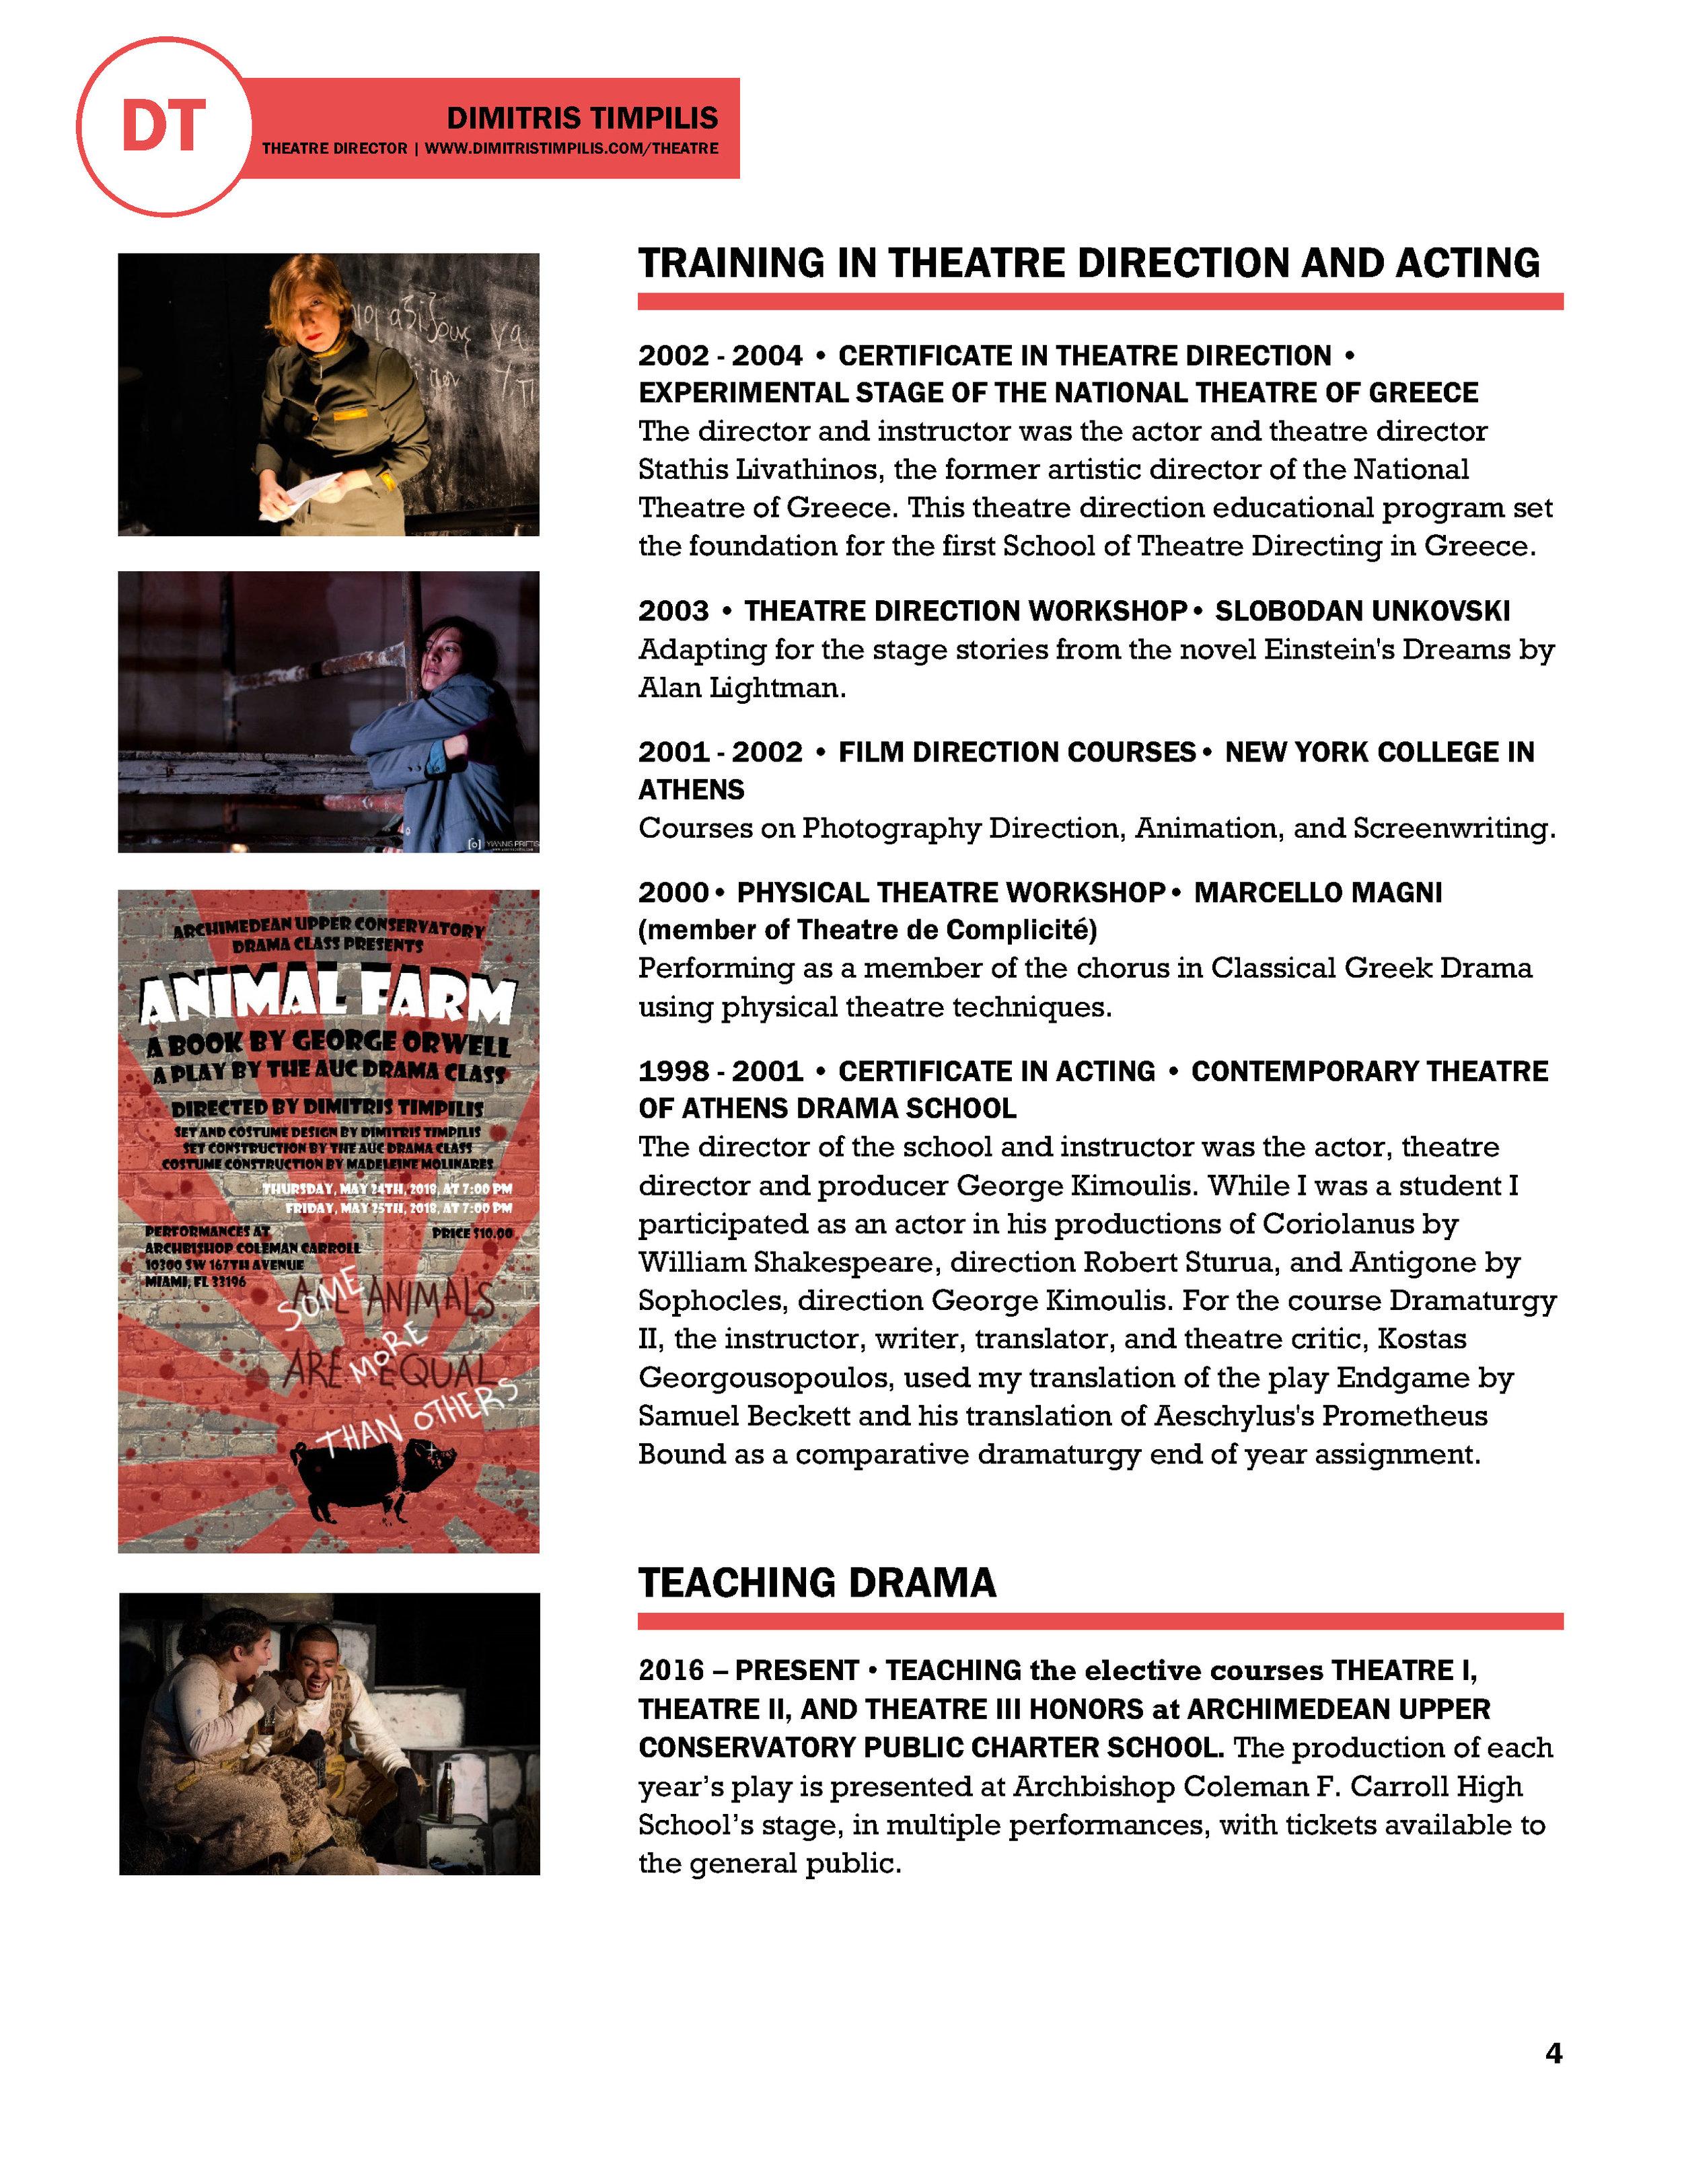 Dimitris Timpilis CV Theatre Director (2018)_Page_4.jpg